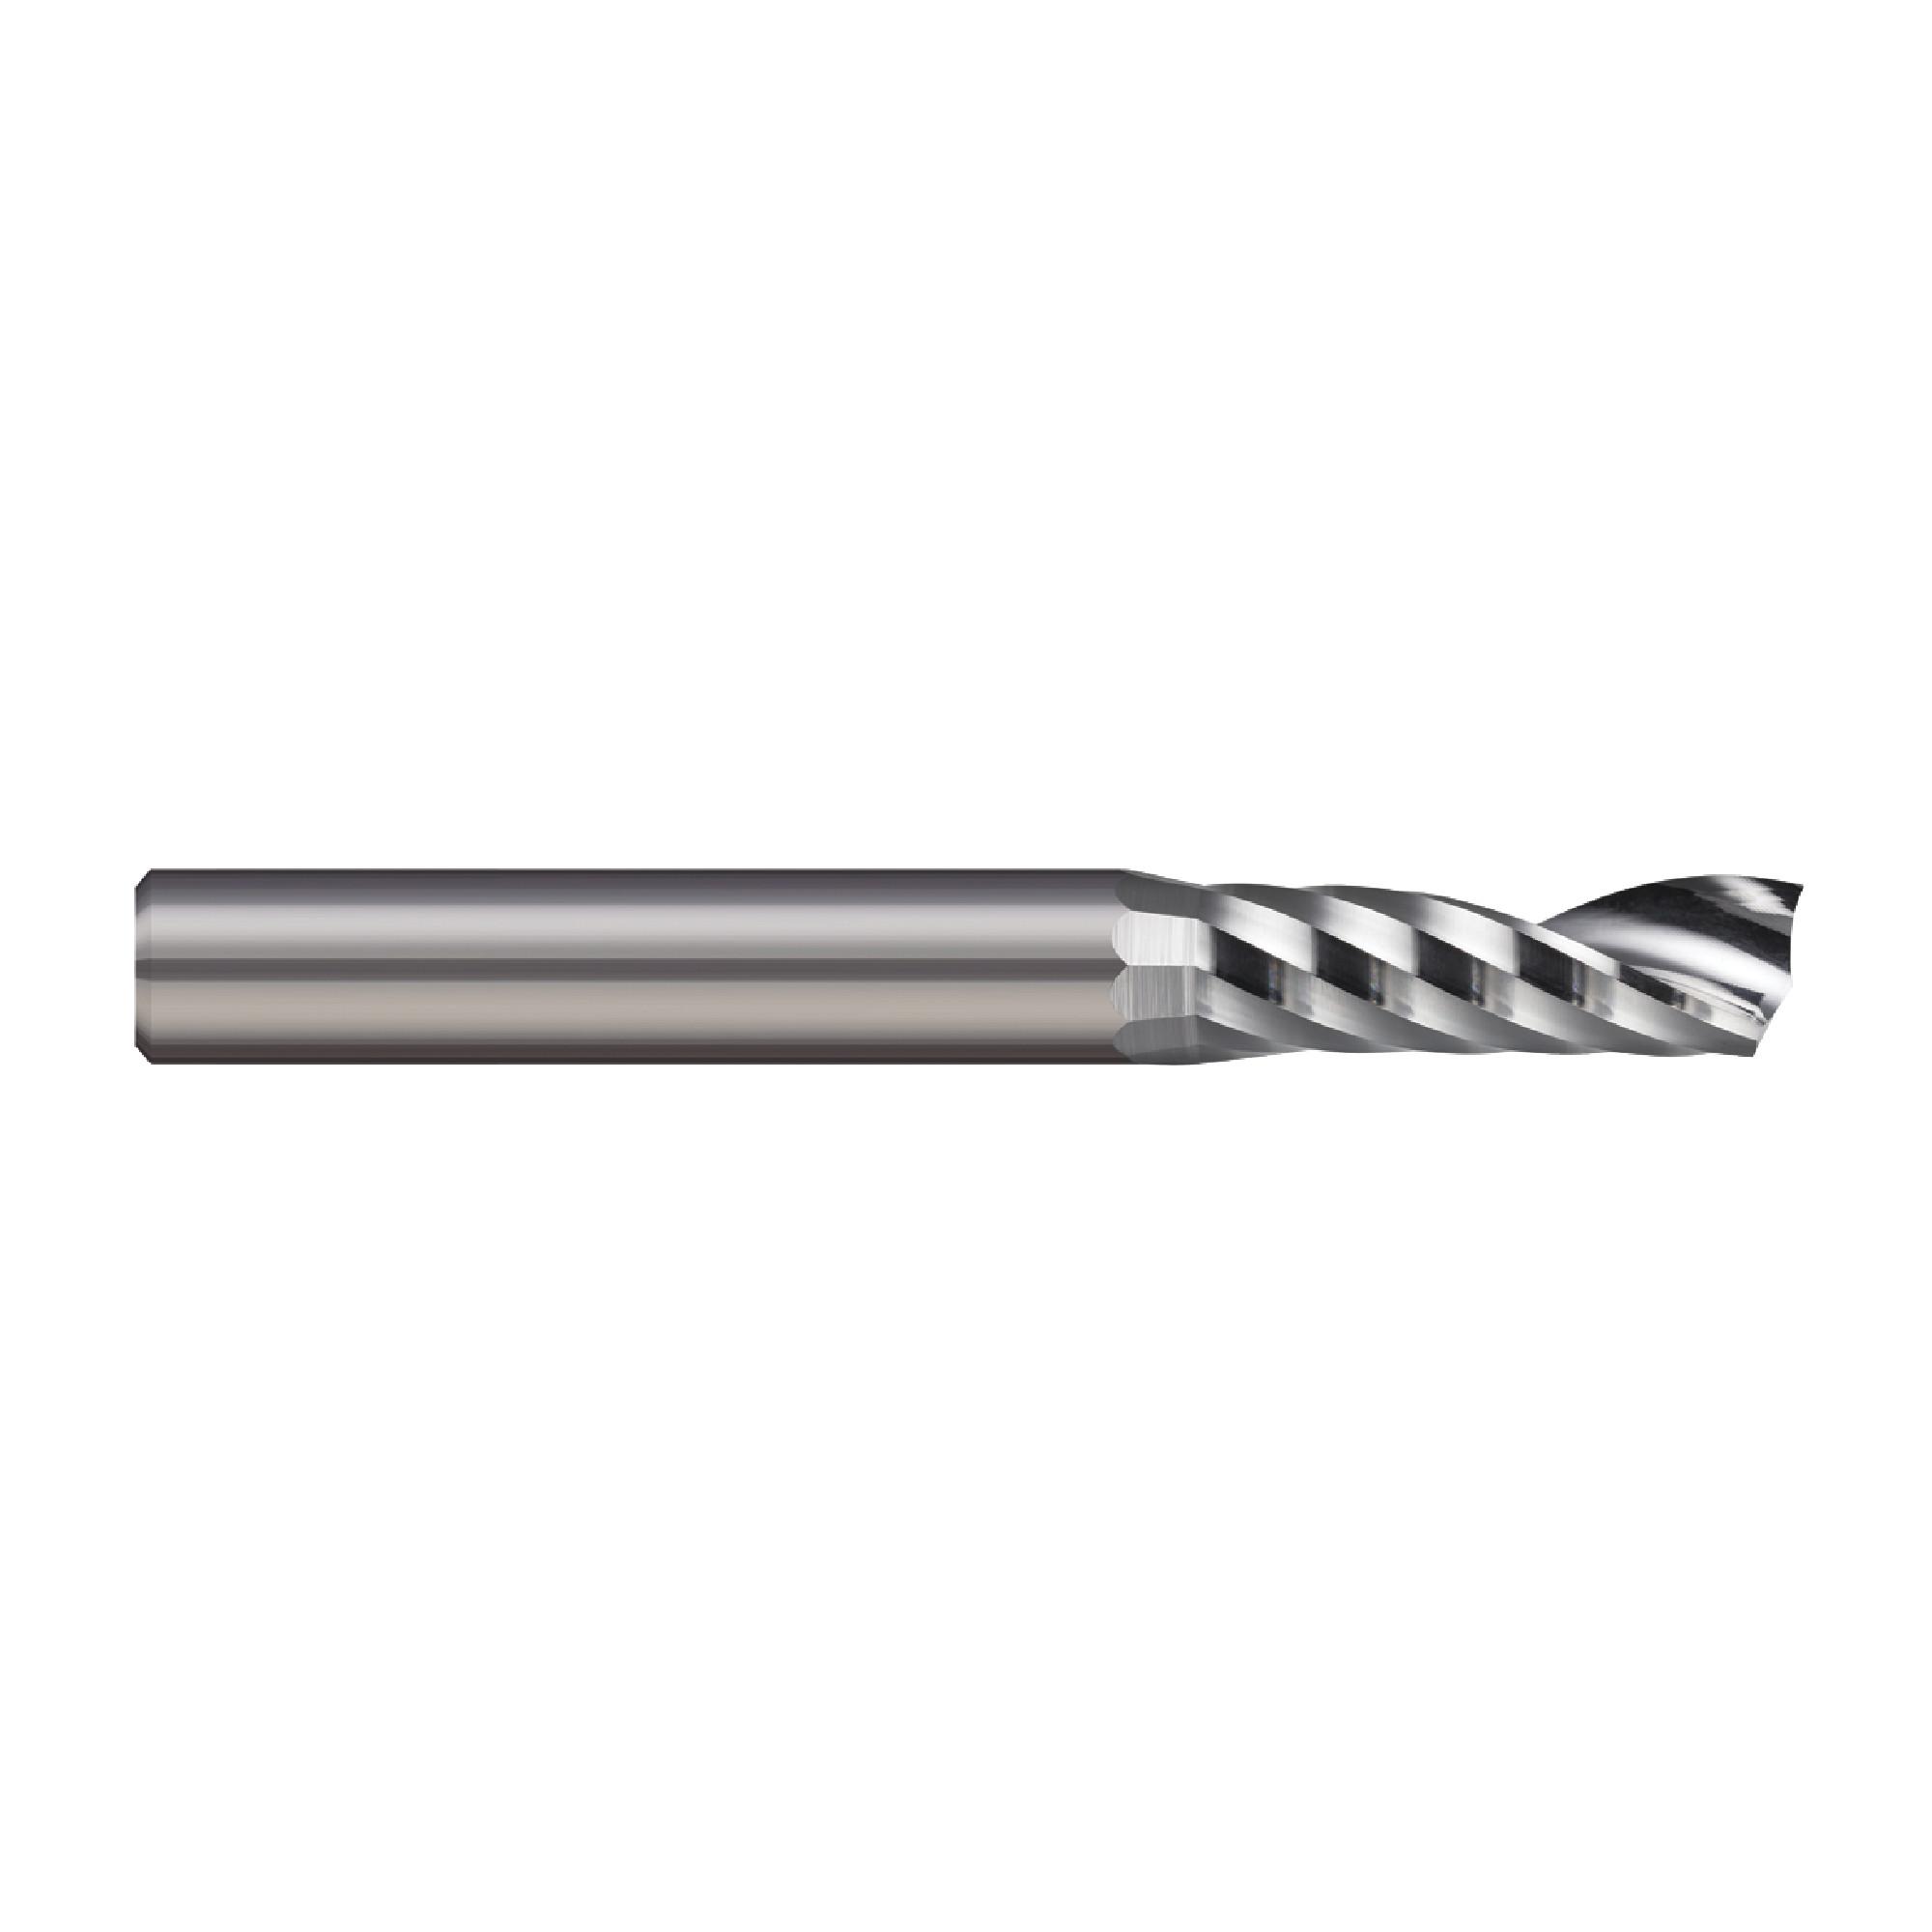 Metric Single Flute Carbide Routers For Aluminum